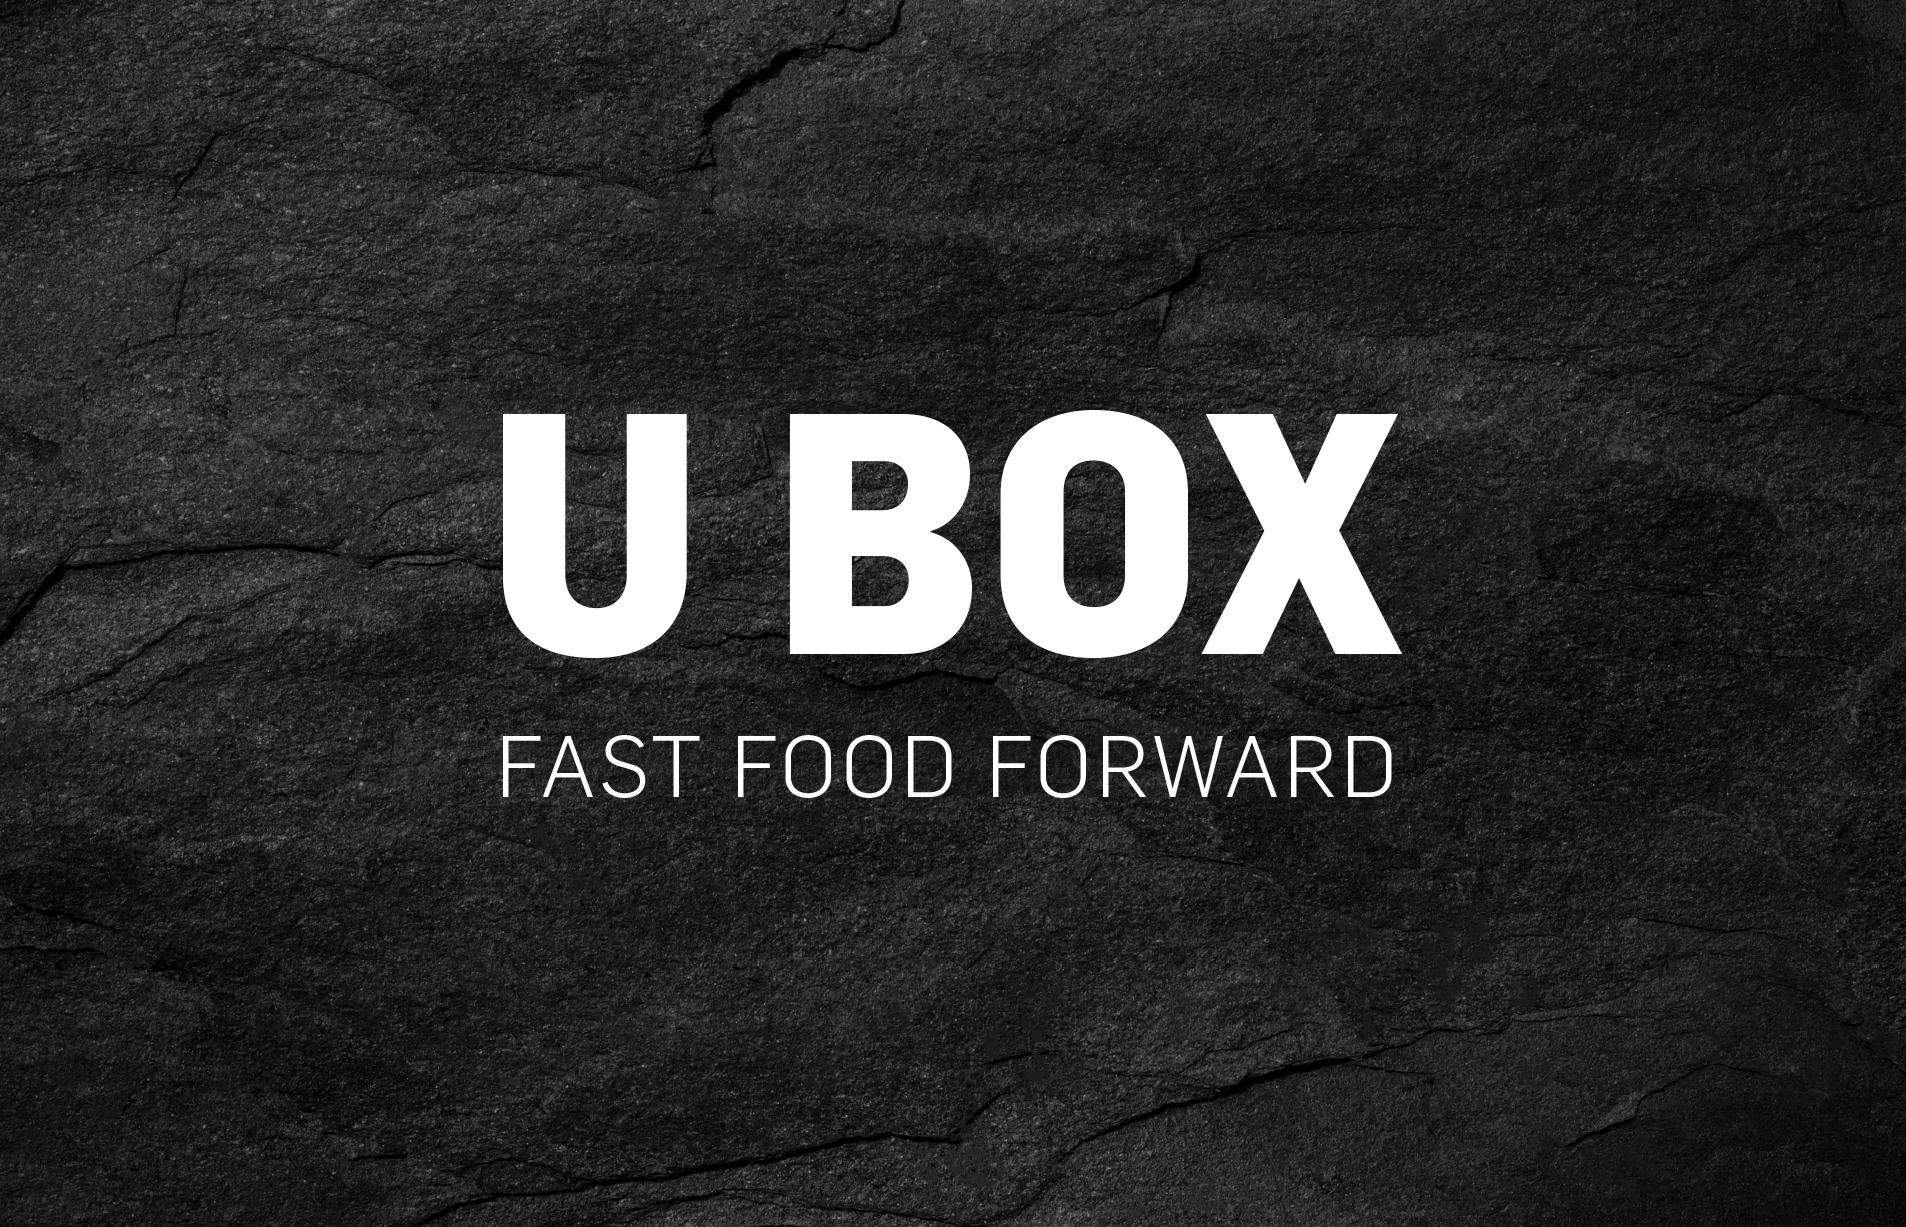 Ubox logo